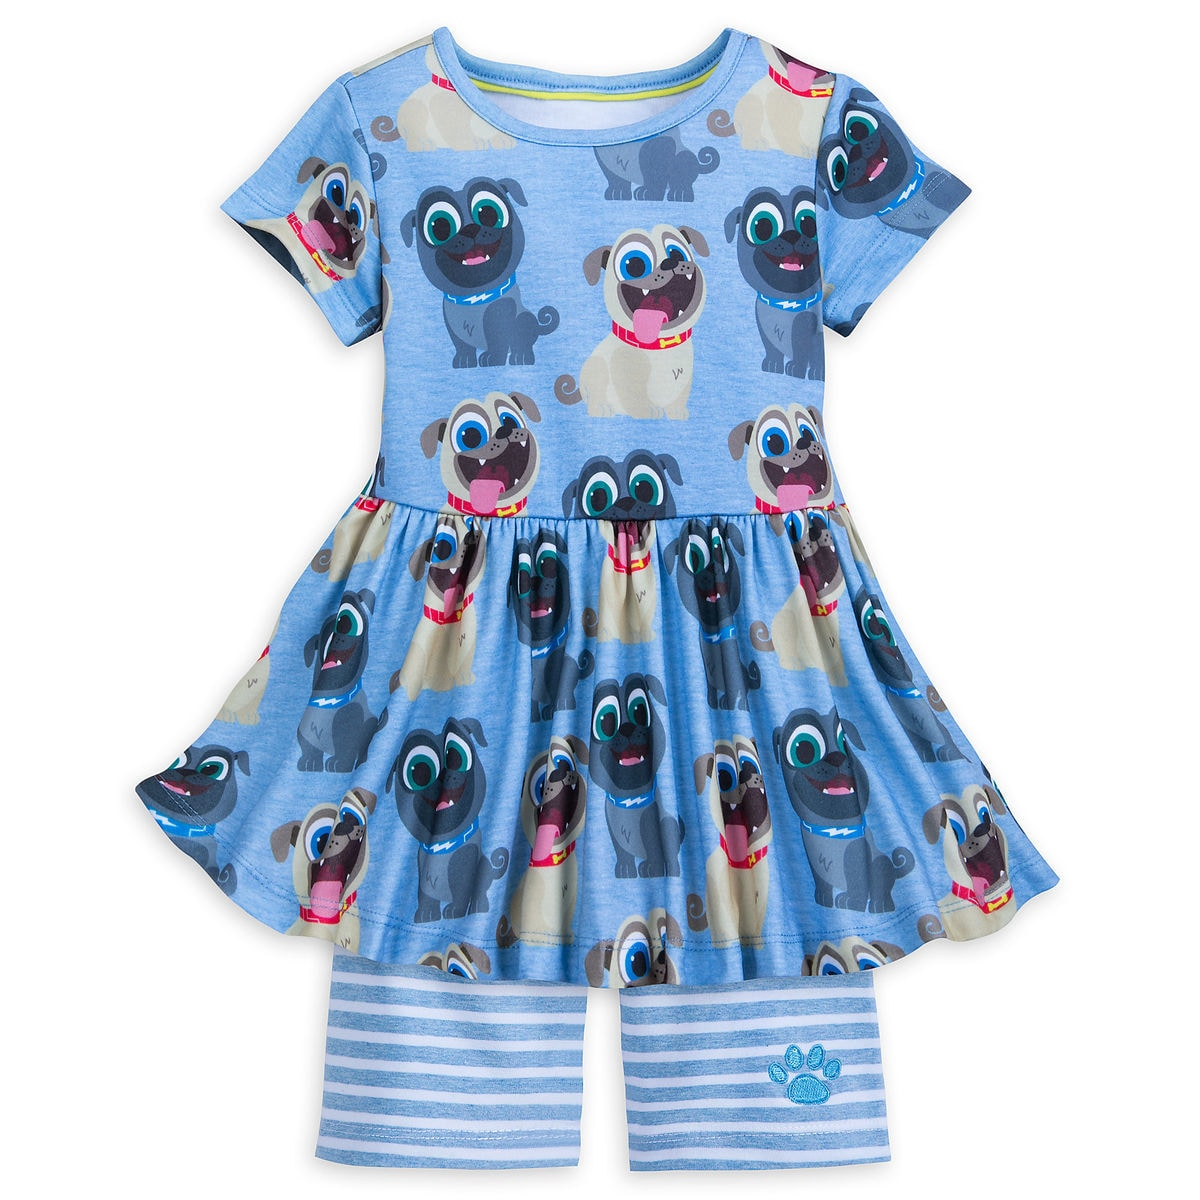 Puppy Dog Pals Dress Set For Girls Shopdisney